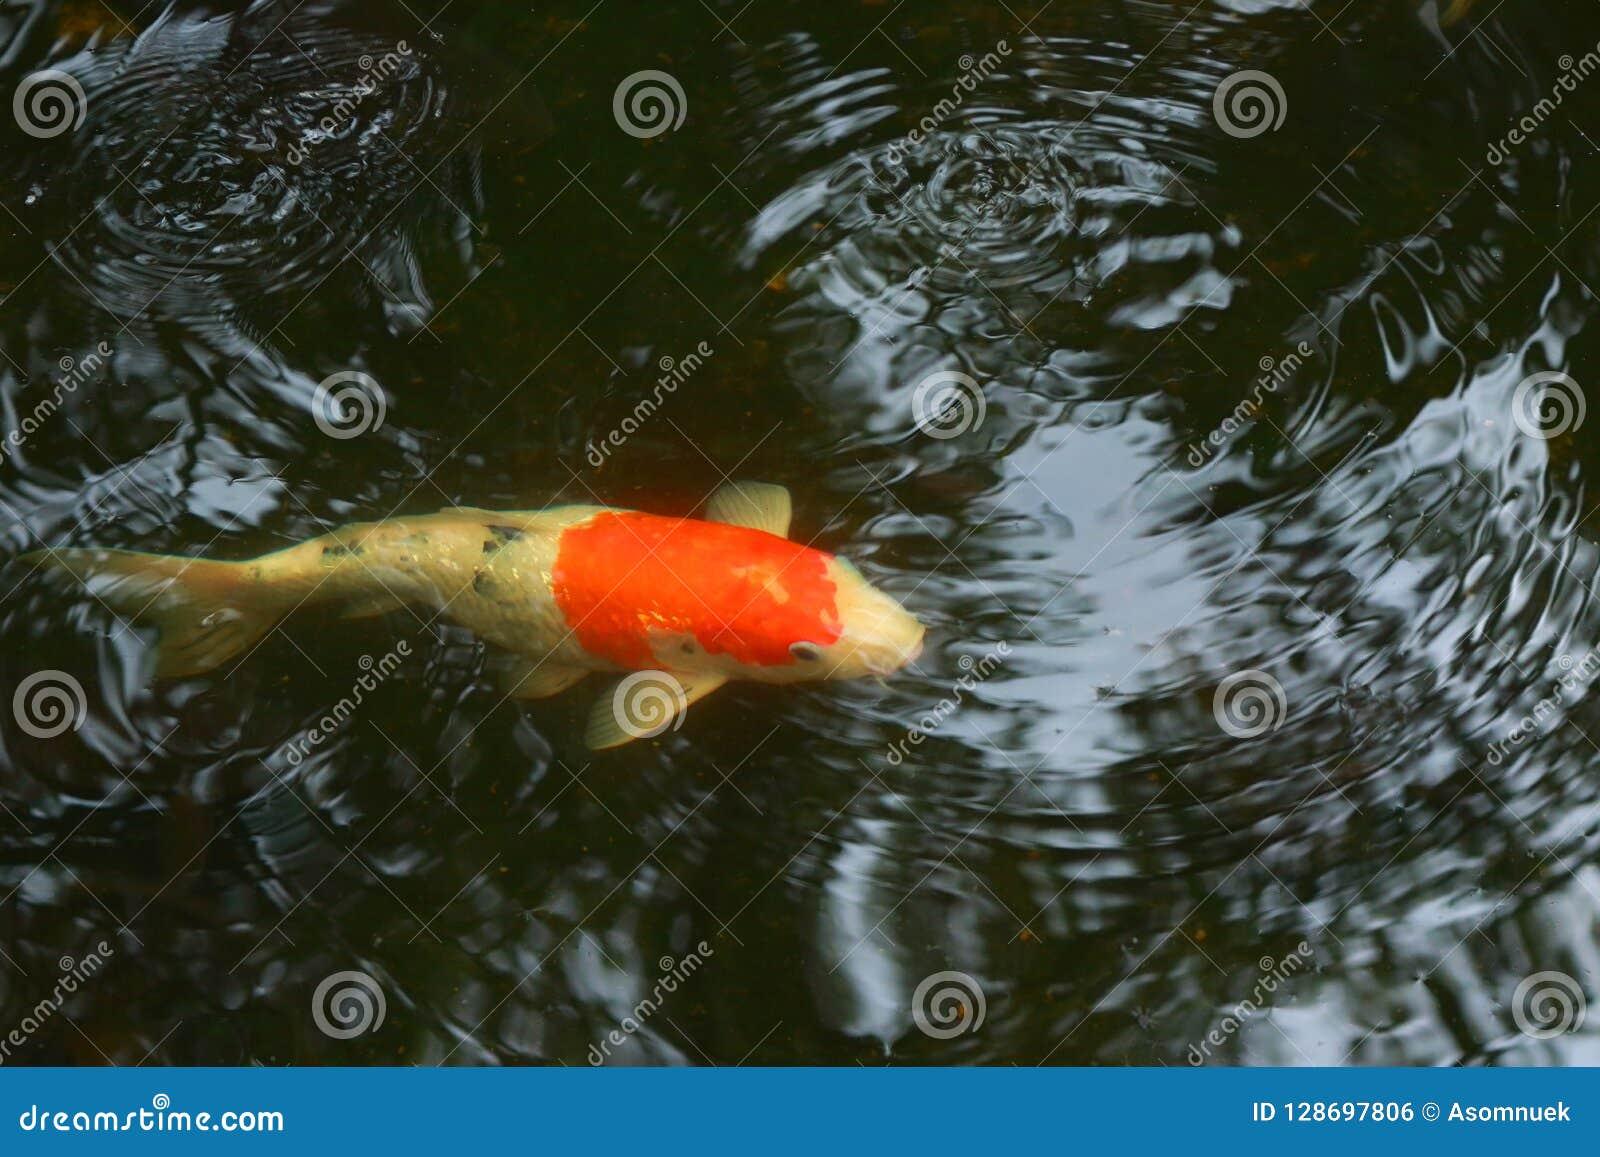 carp fish, best wish forever